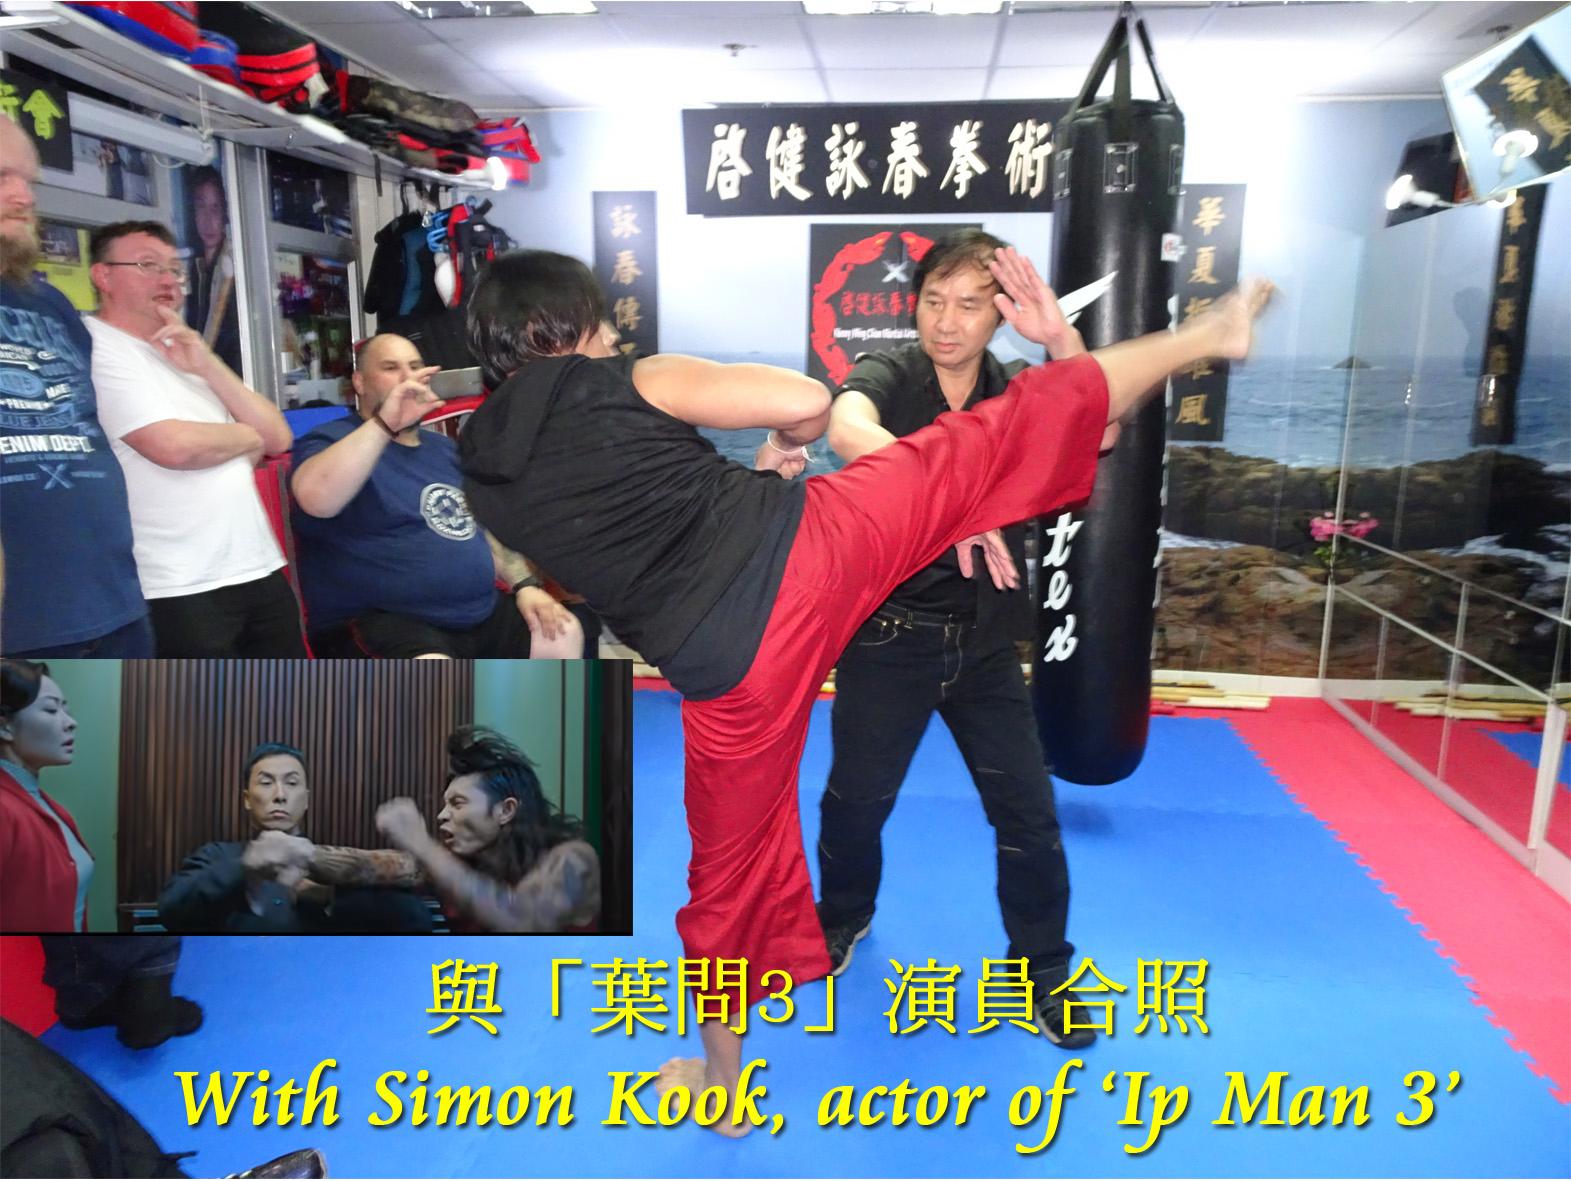 Simon Kook